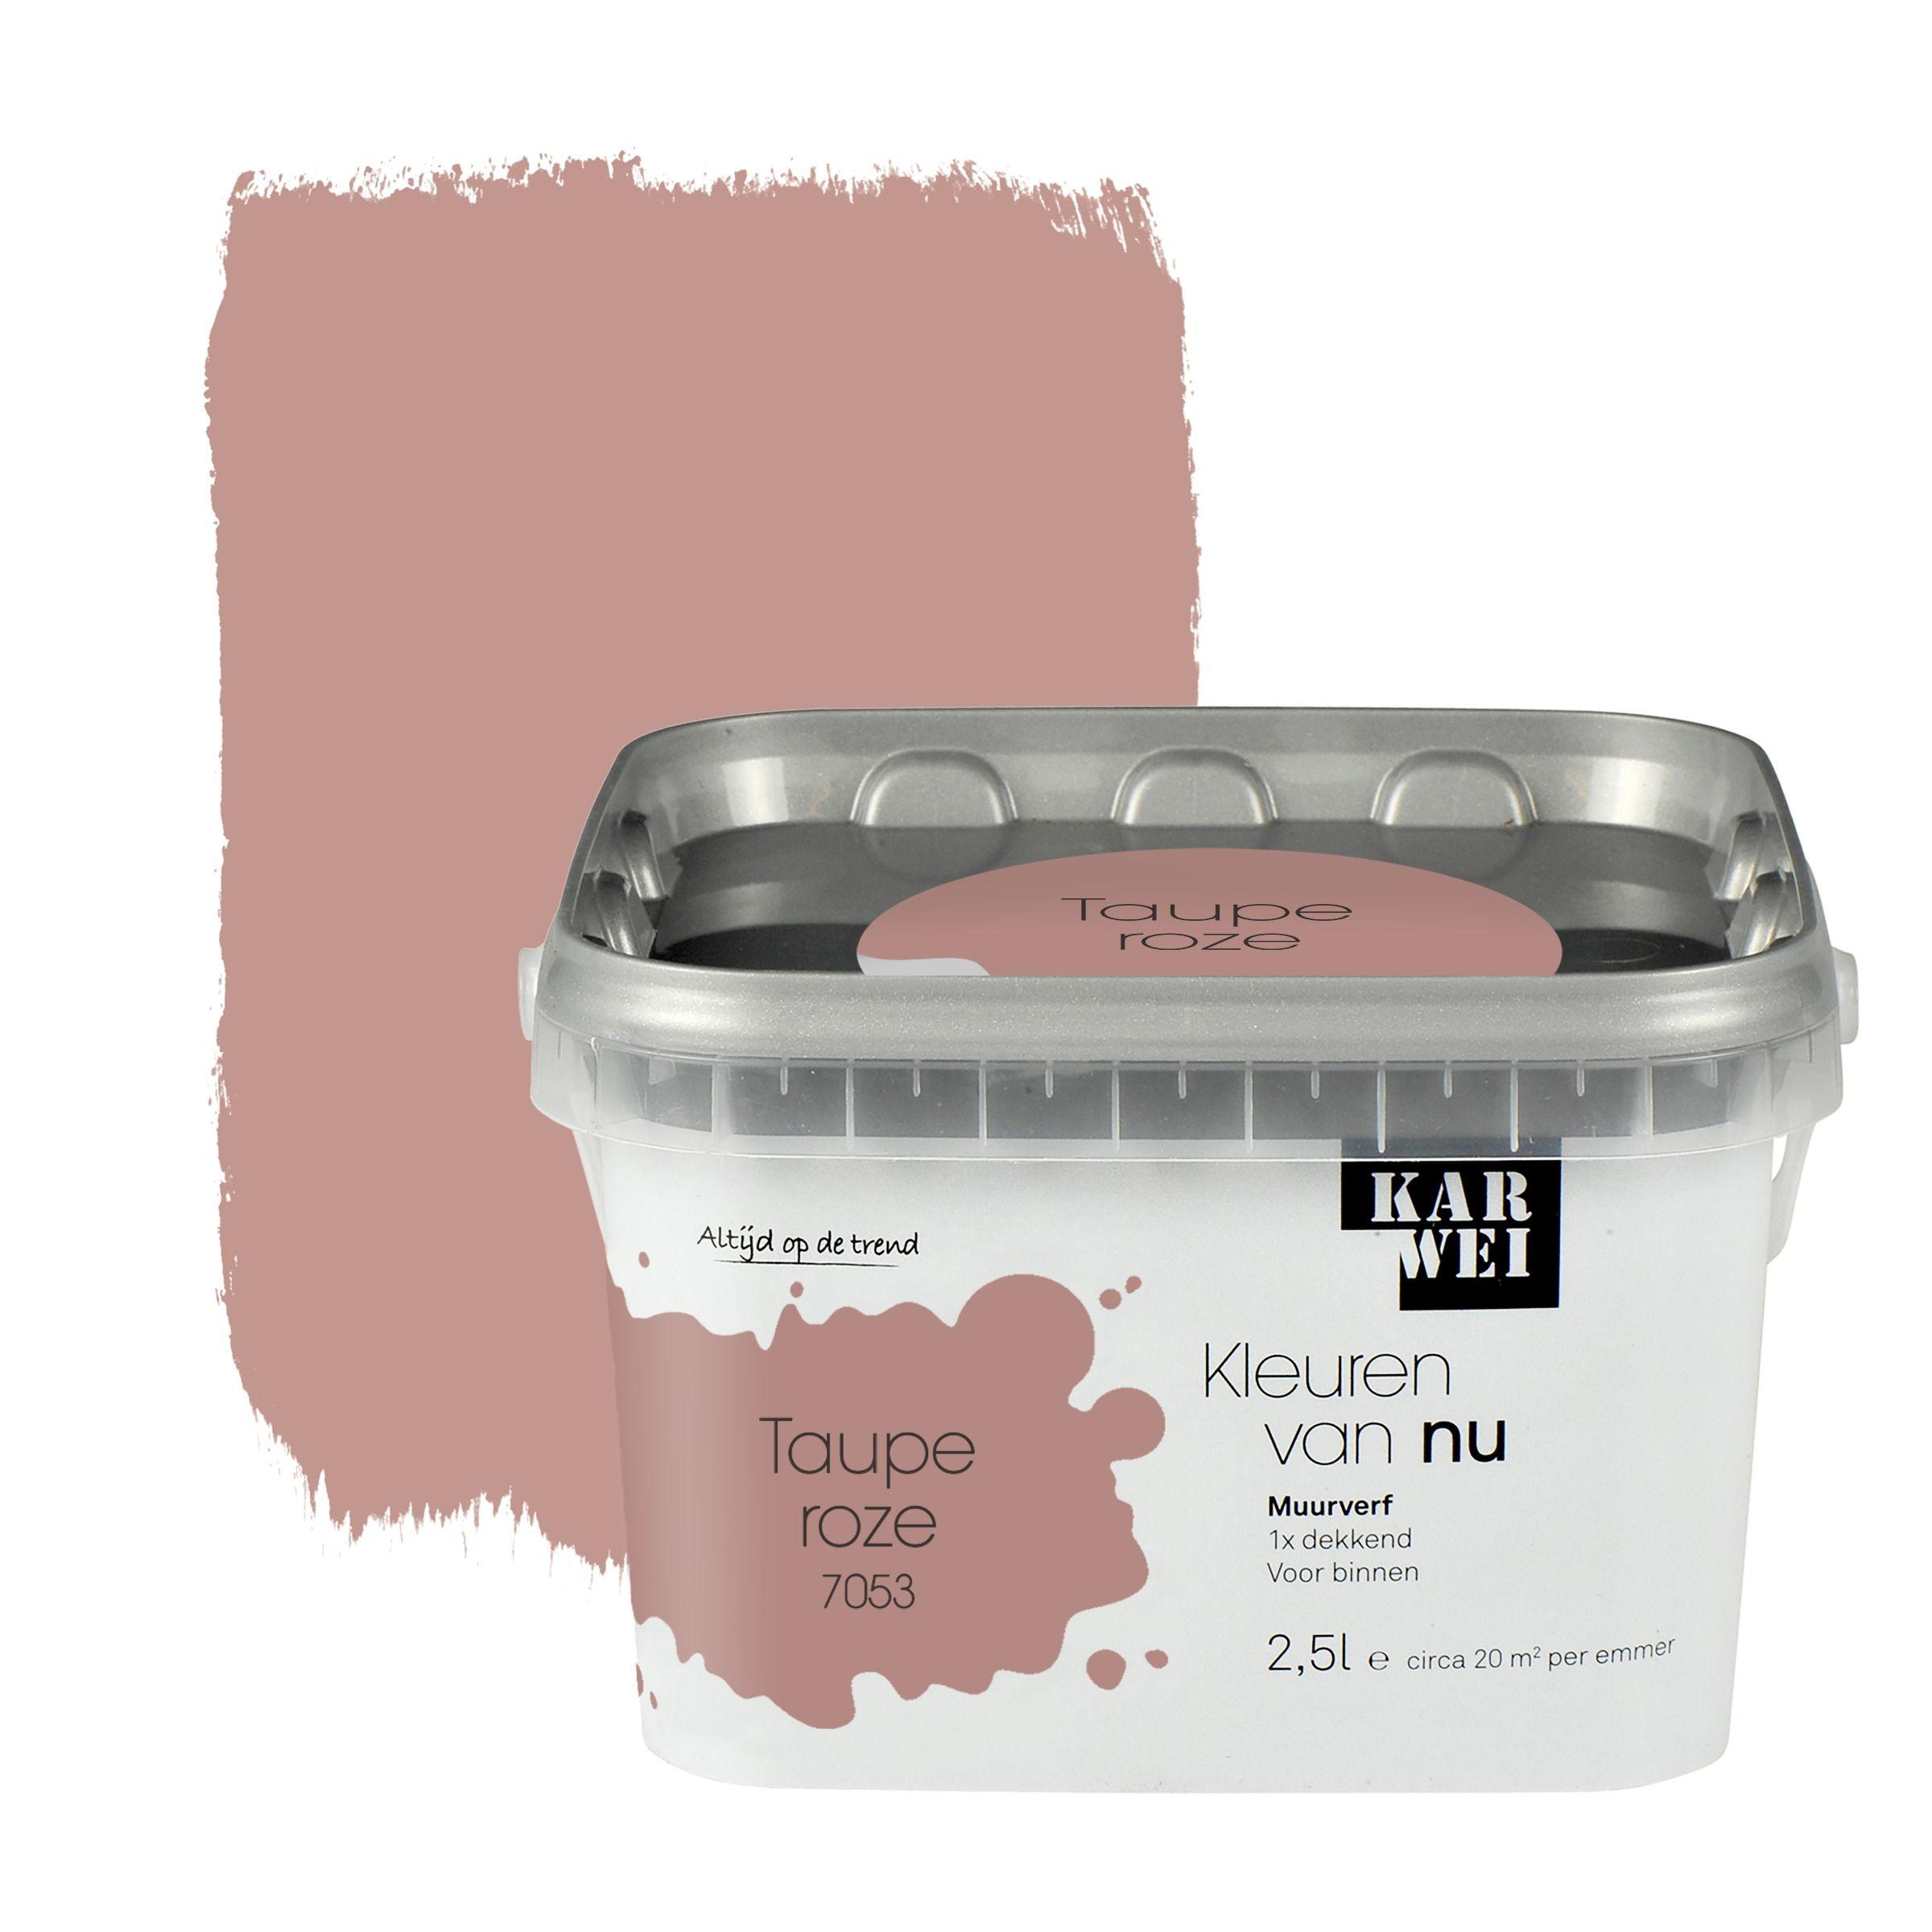 KARWEI Kleuren van Nu muurverf mat tauperoze 2,5 l kopen? | Karwei